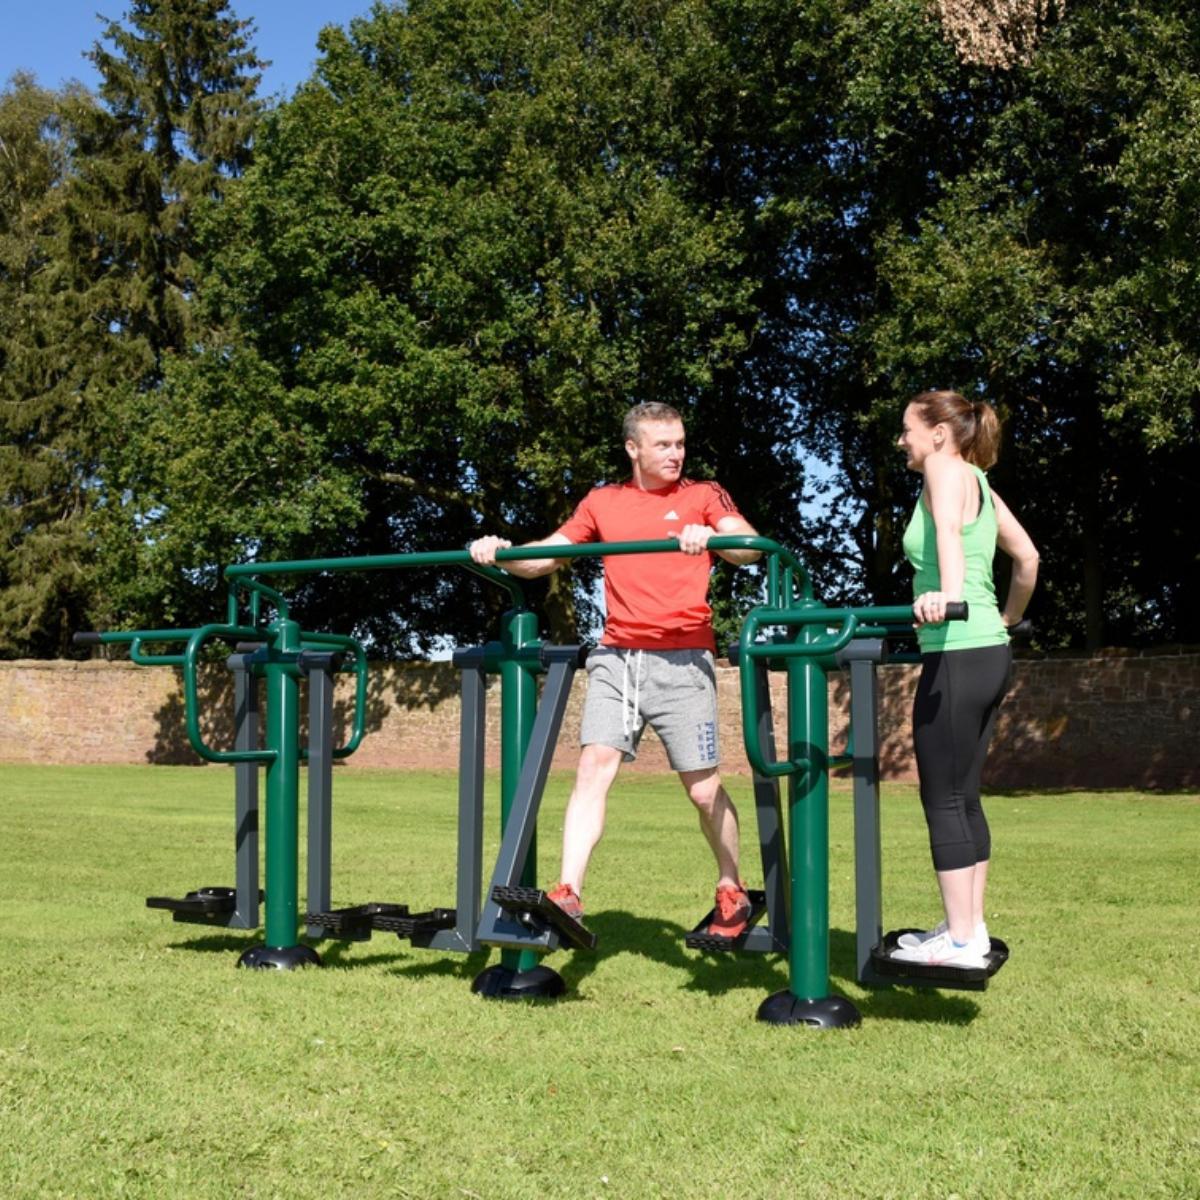 Energise Multi Gym | Sunshine Gym | Outdoor Gym Equipment